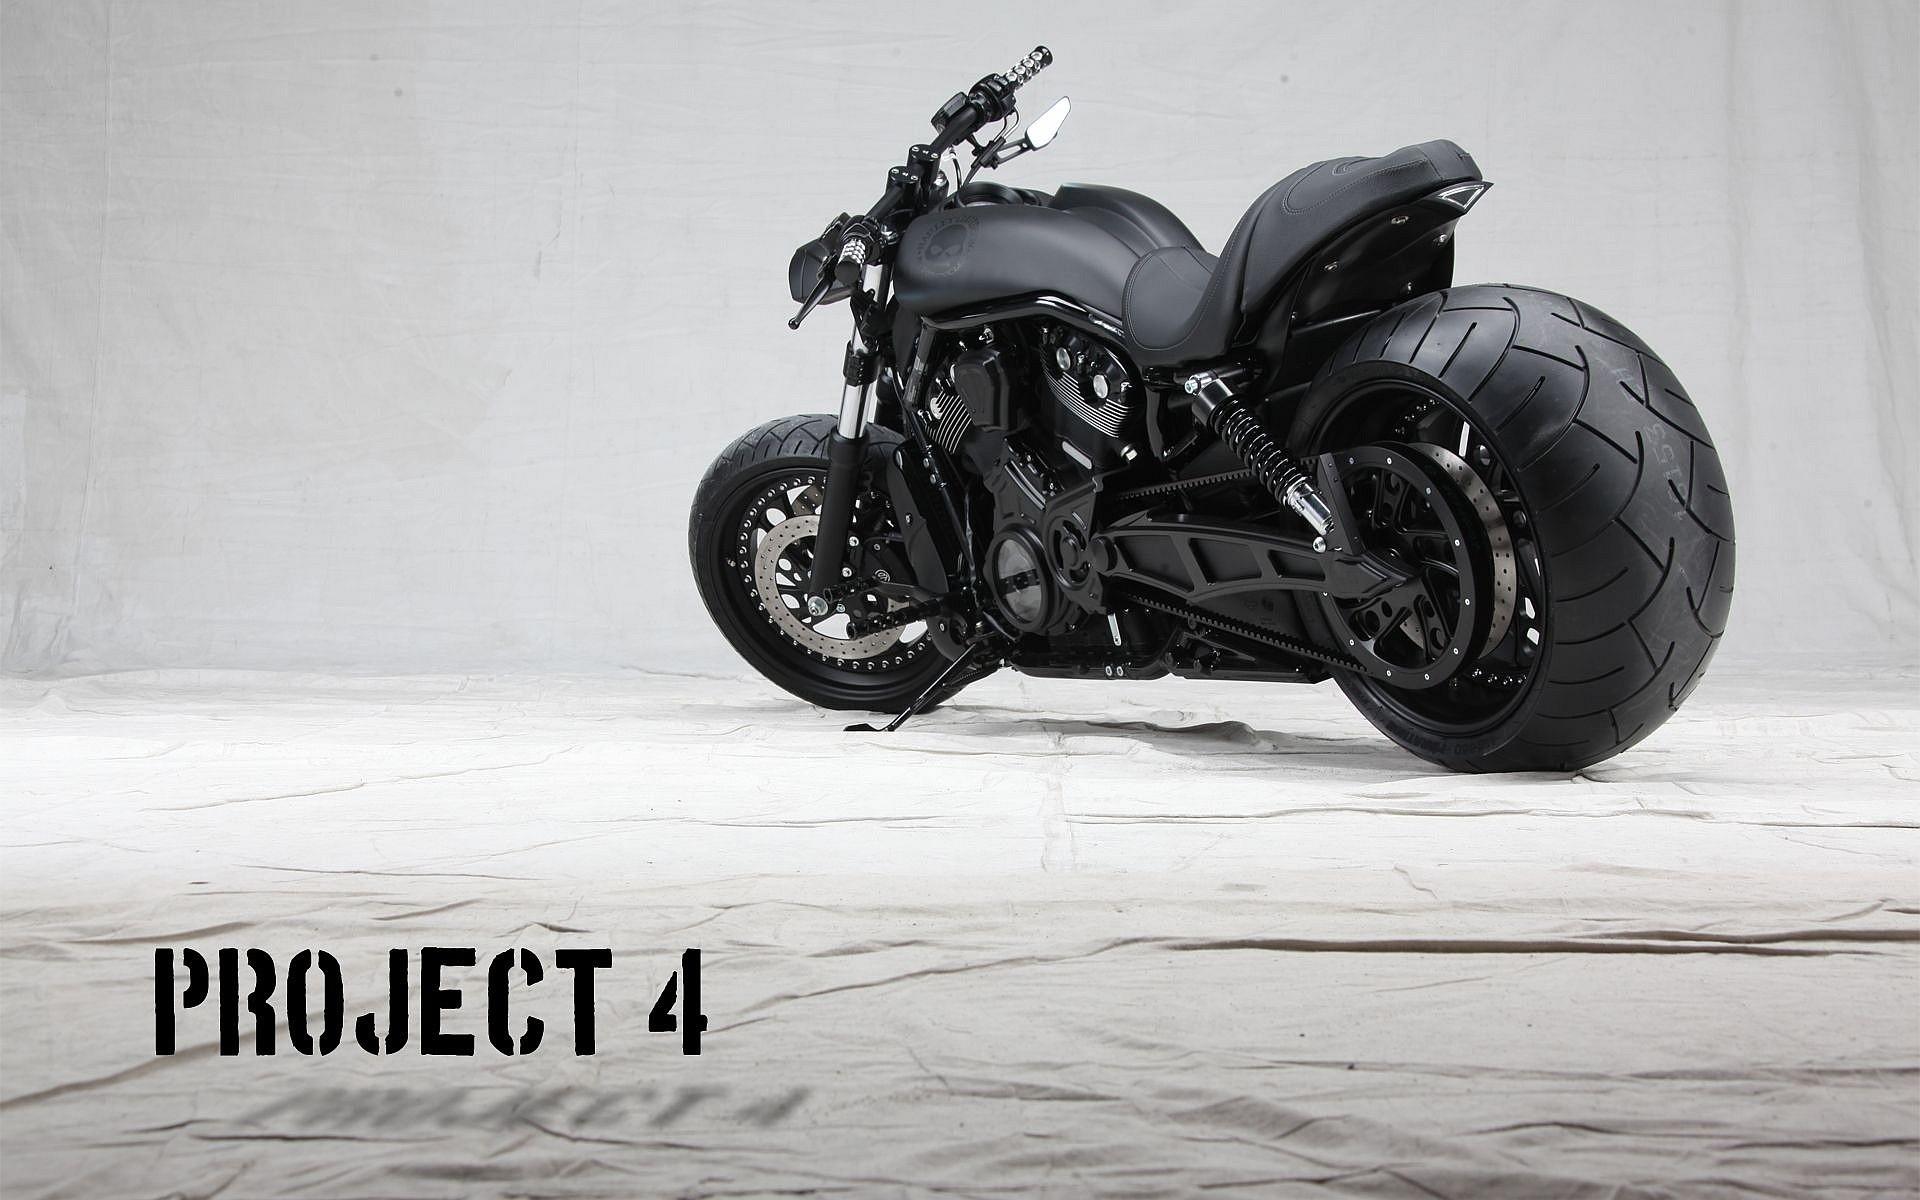 1920x1200, Black Harley Davidson Project Four Wallpaper - Harley Davidson V Rod Hd - HD Wallpaper